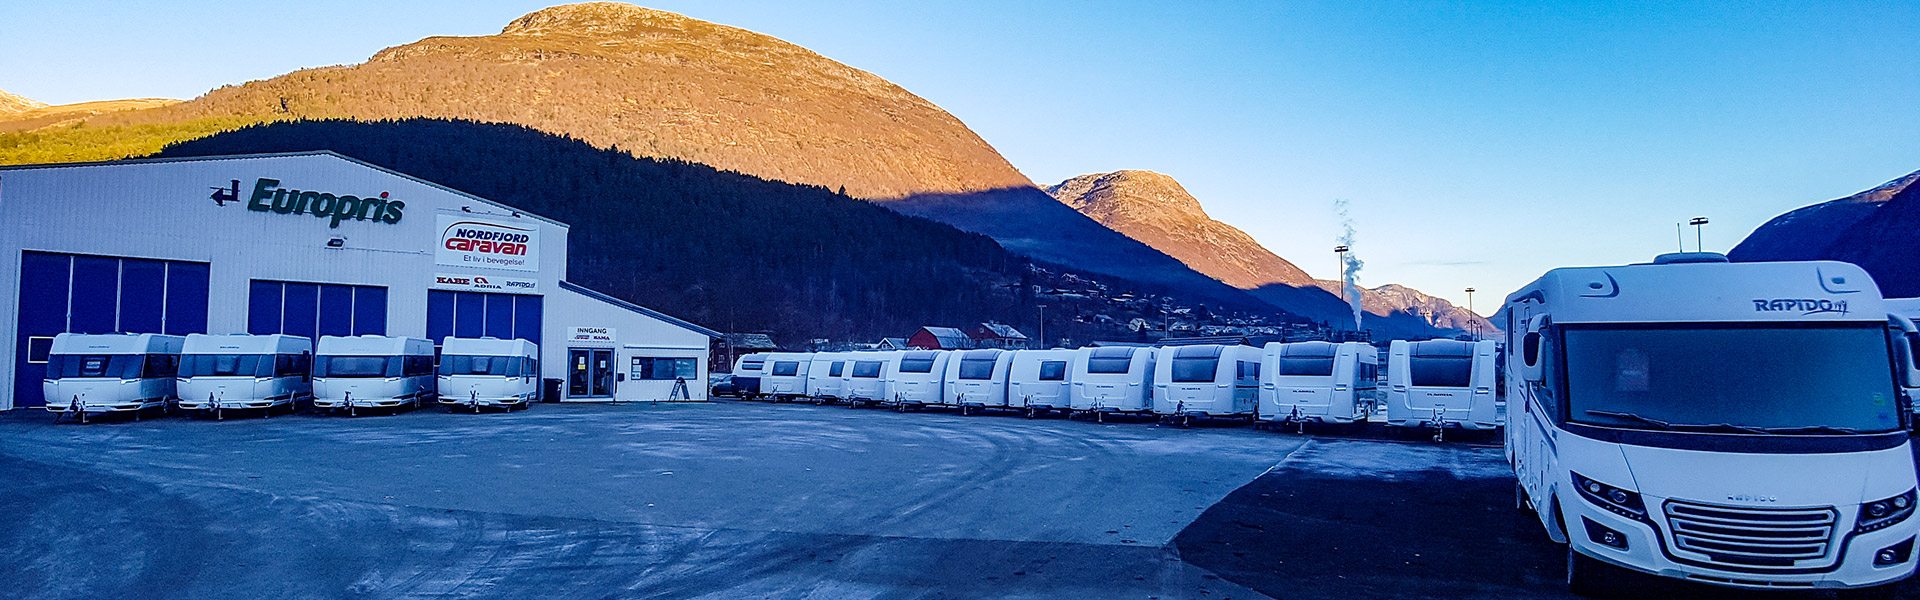 Nordfjord Caravan, Eit liv i bevegelse!